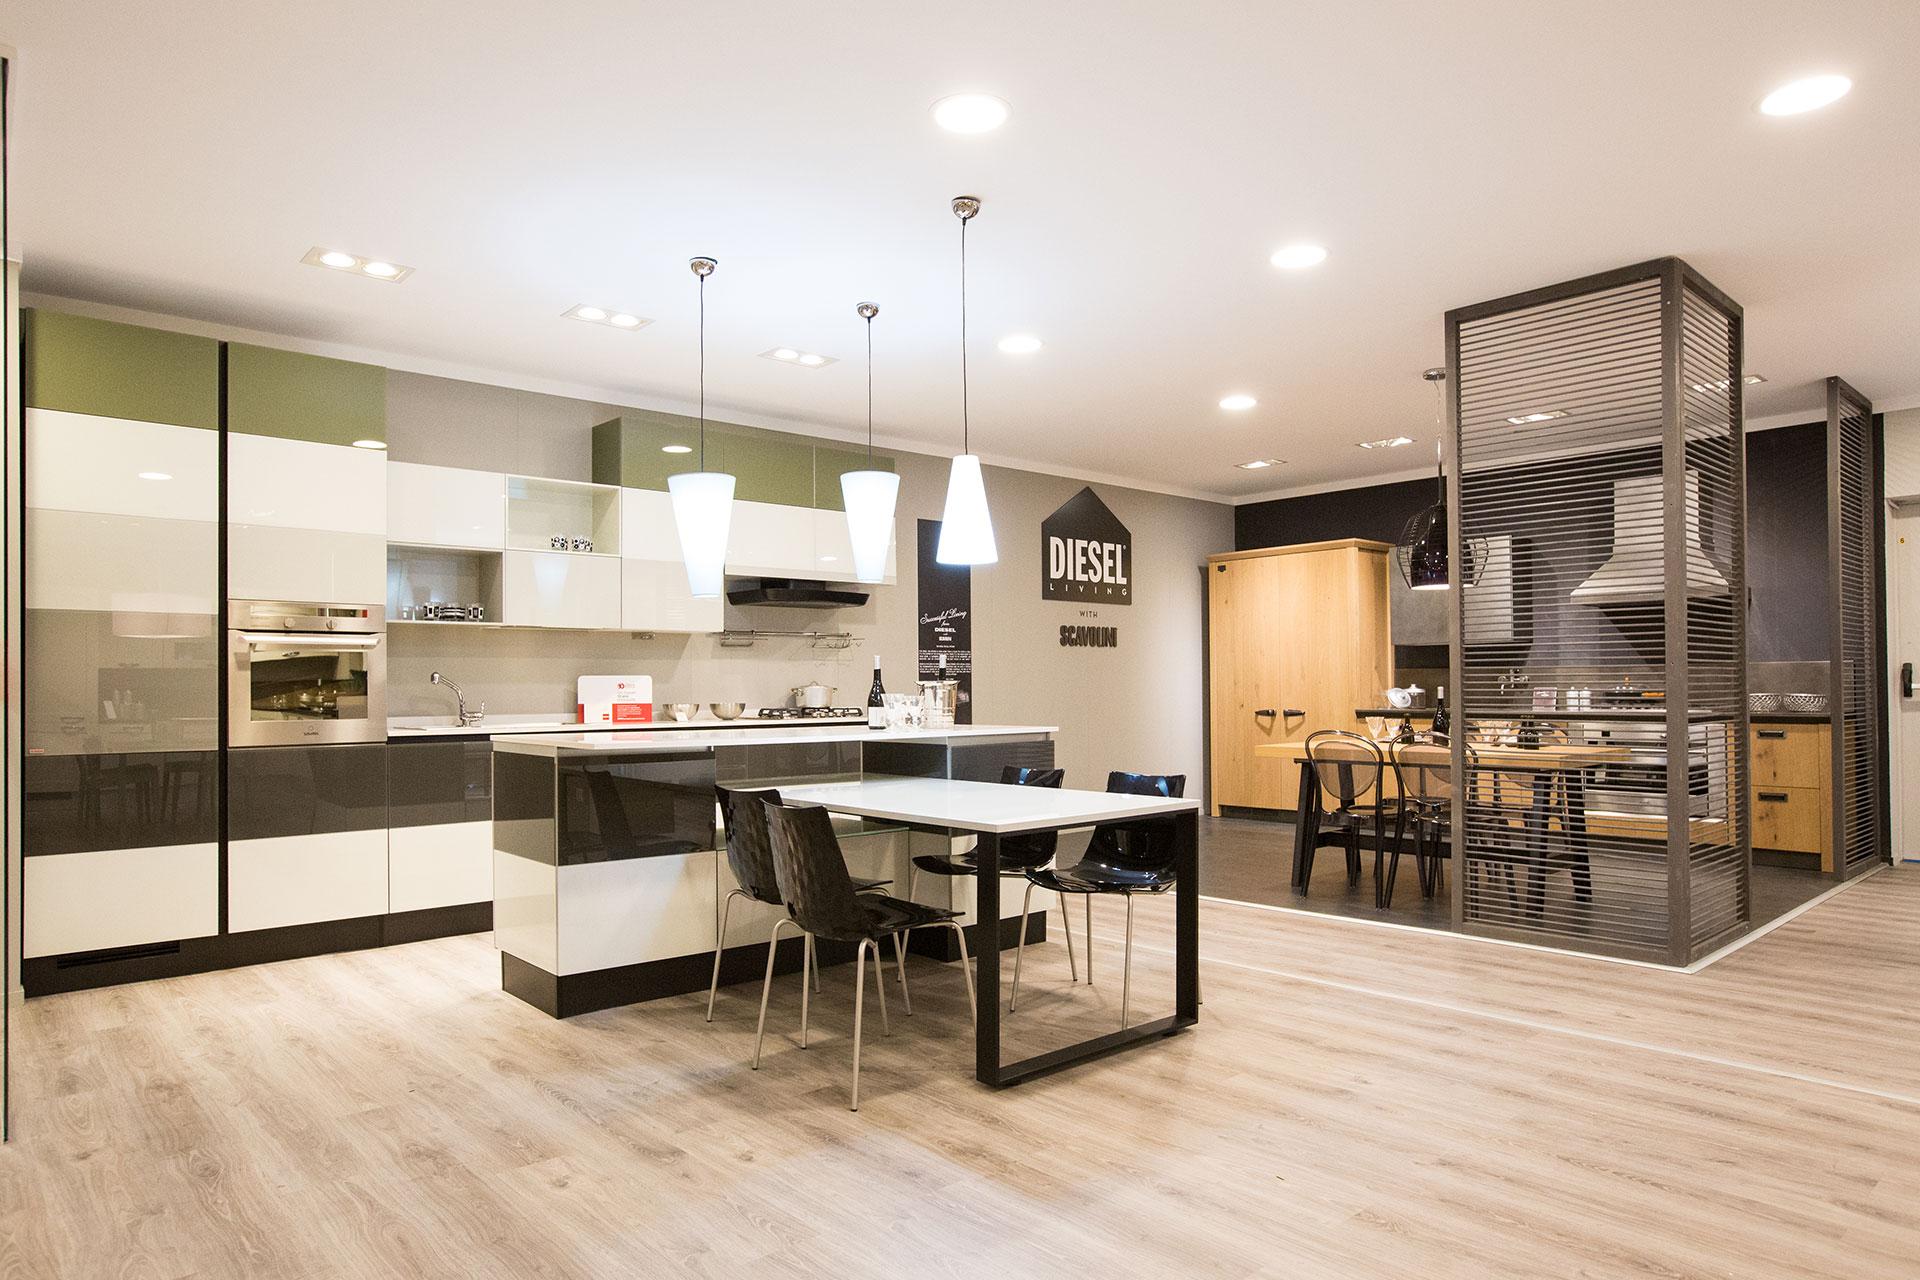 Cucina scavolini tetris e diesel | Carnero Casa